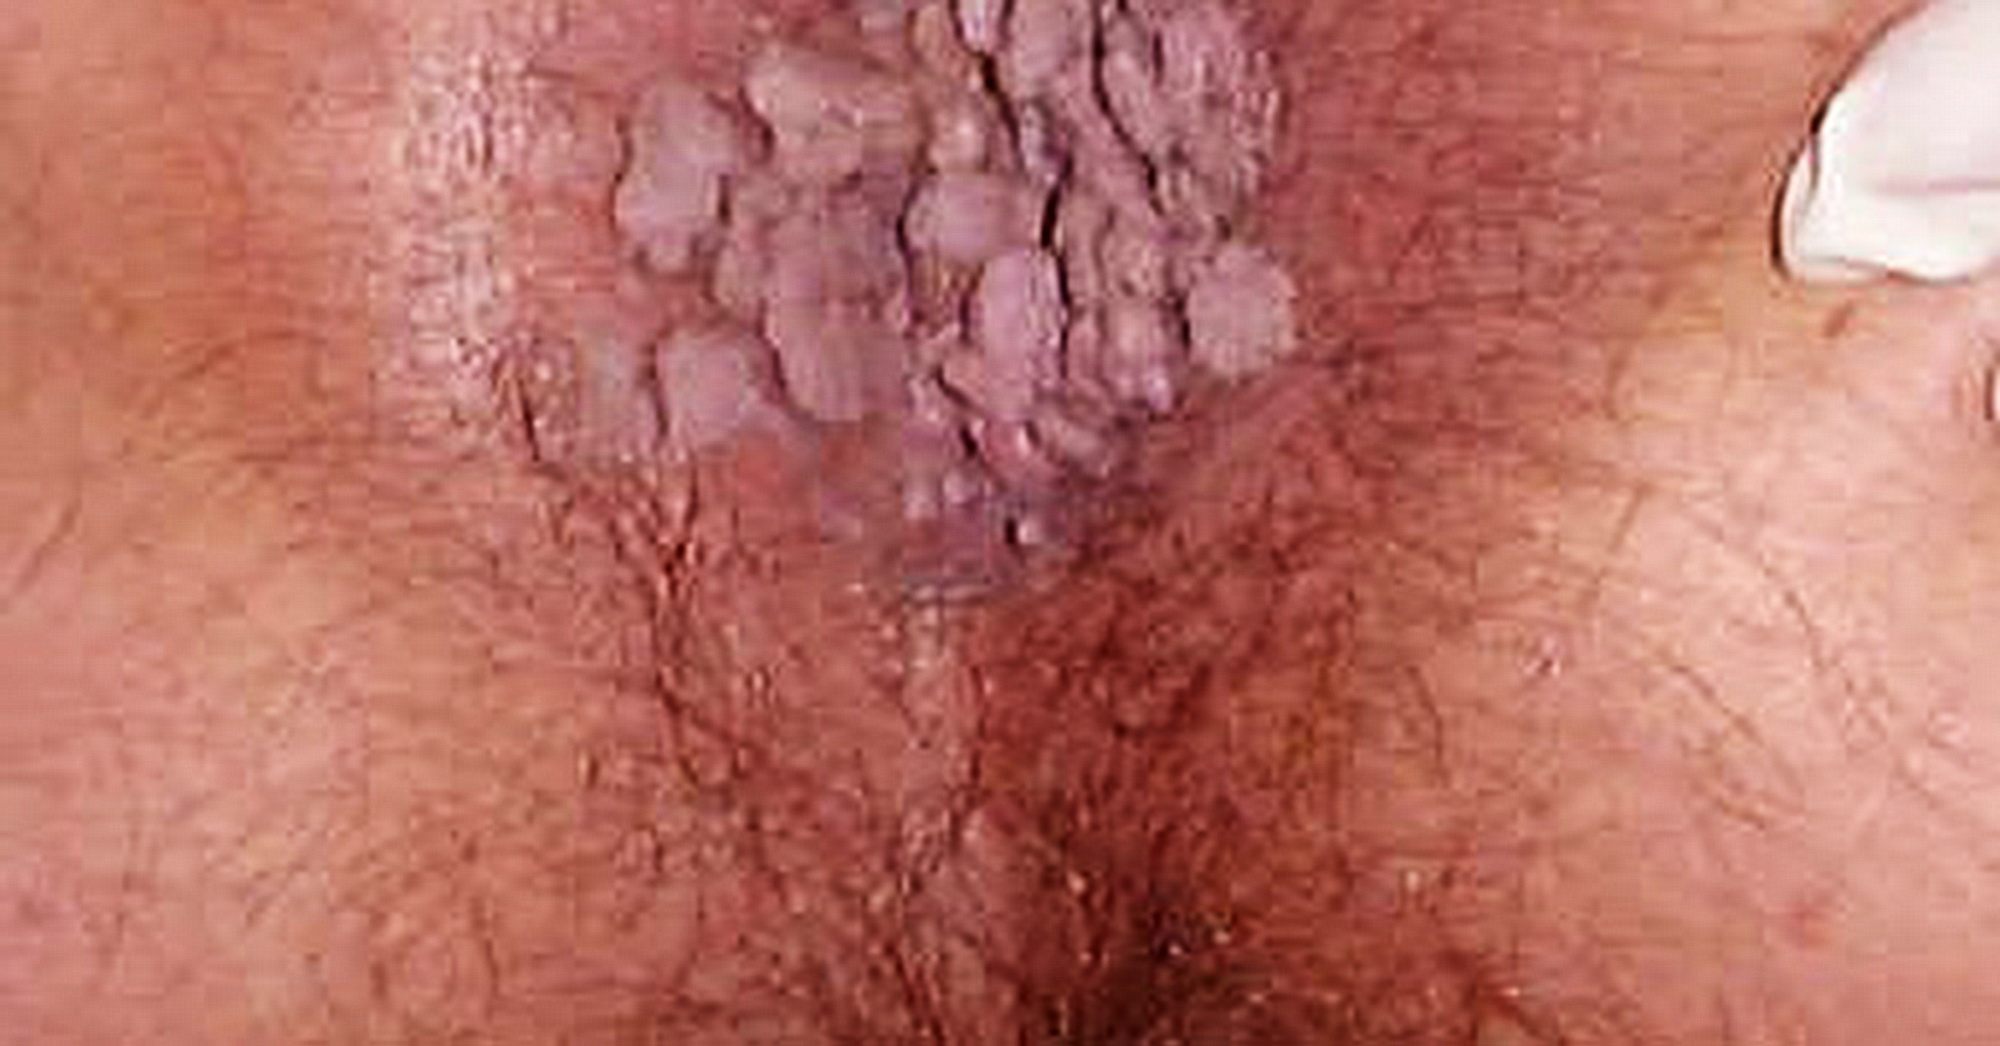 împotriva paraziților, desigur papilloma of the bladder